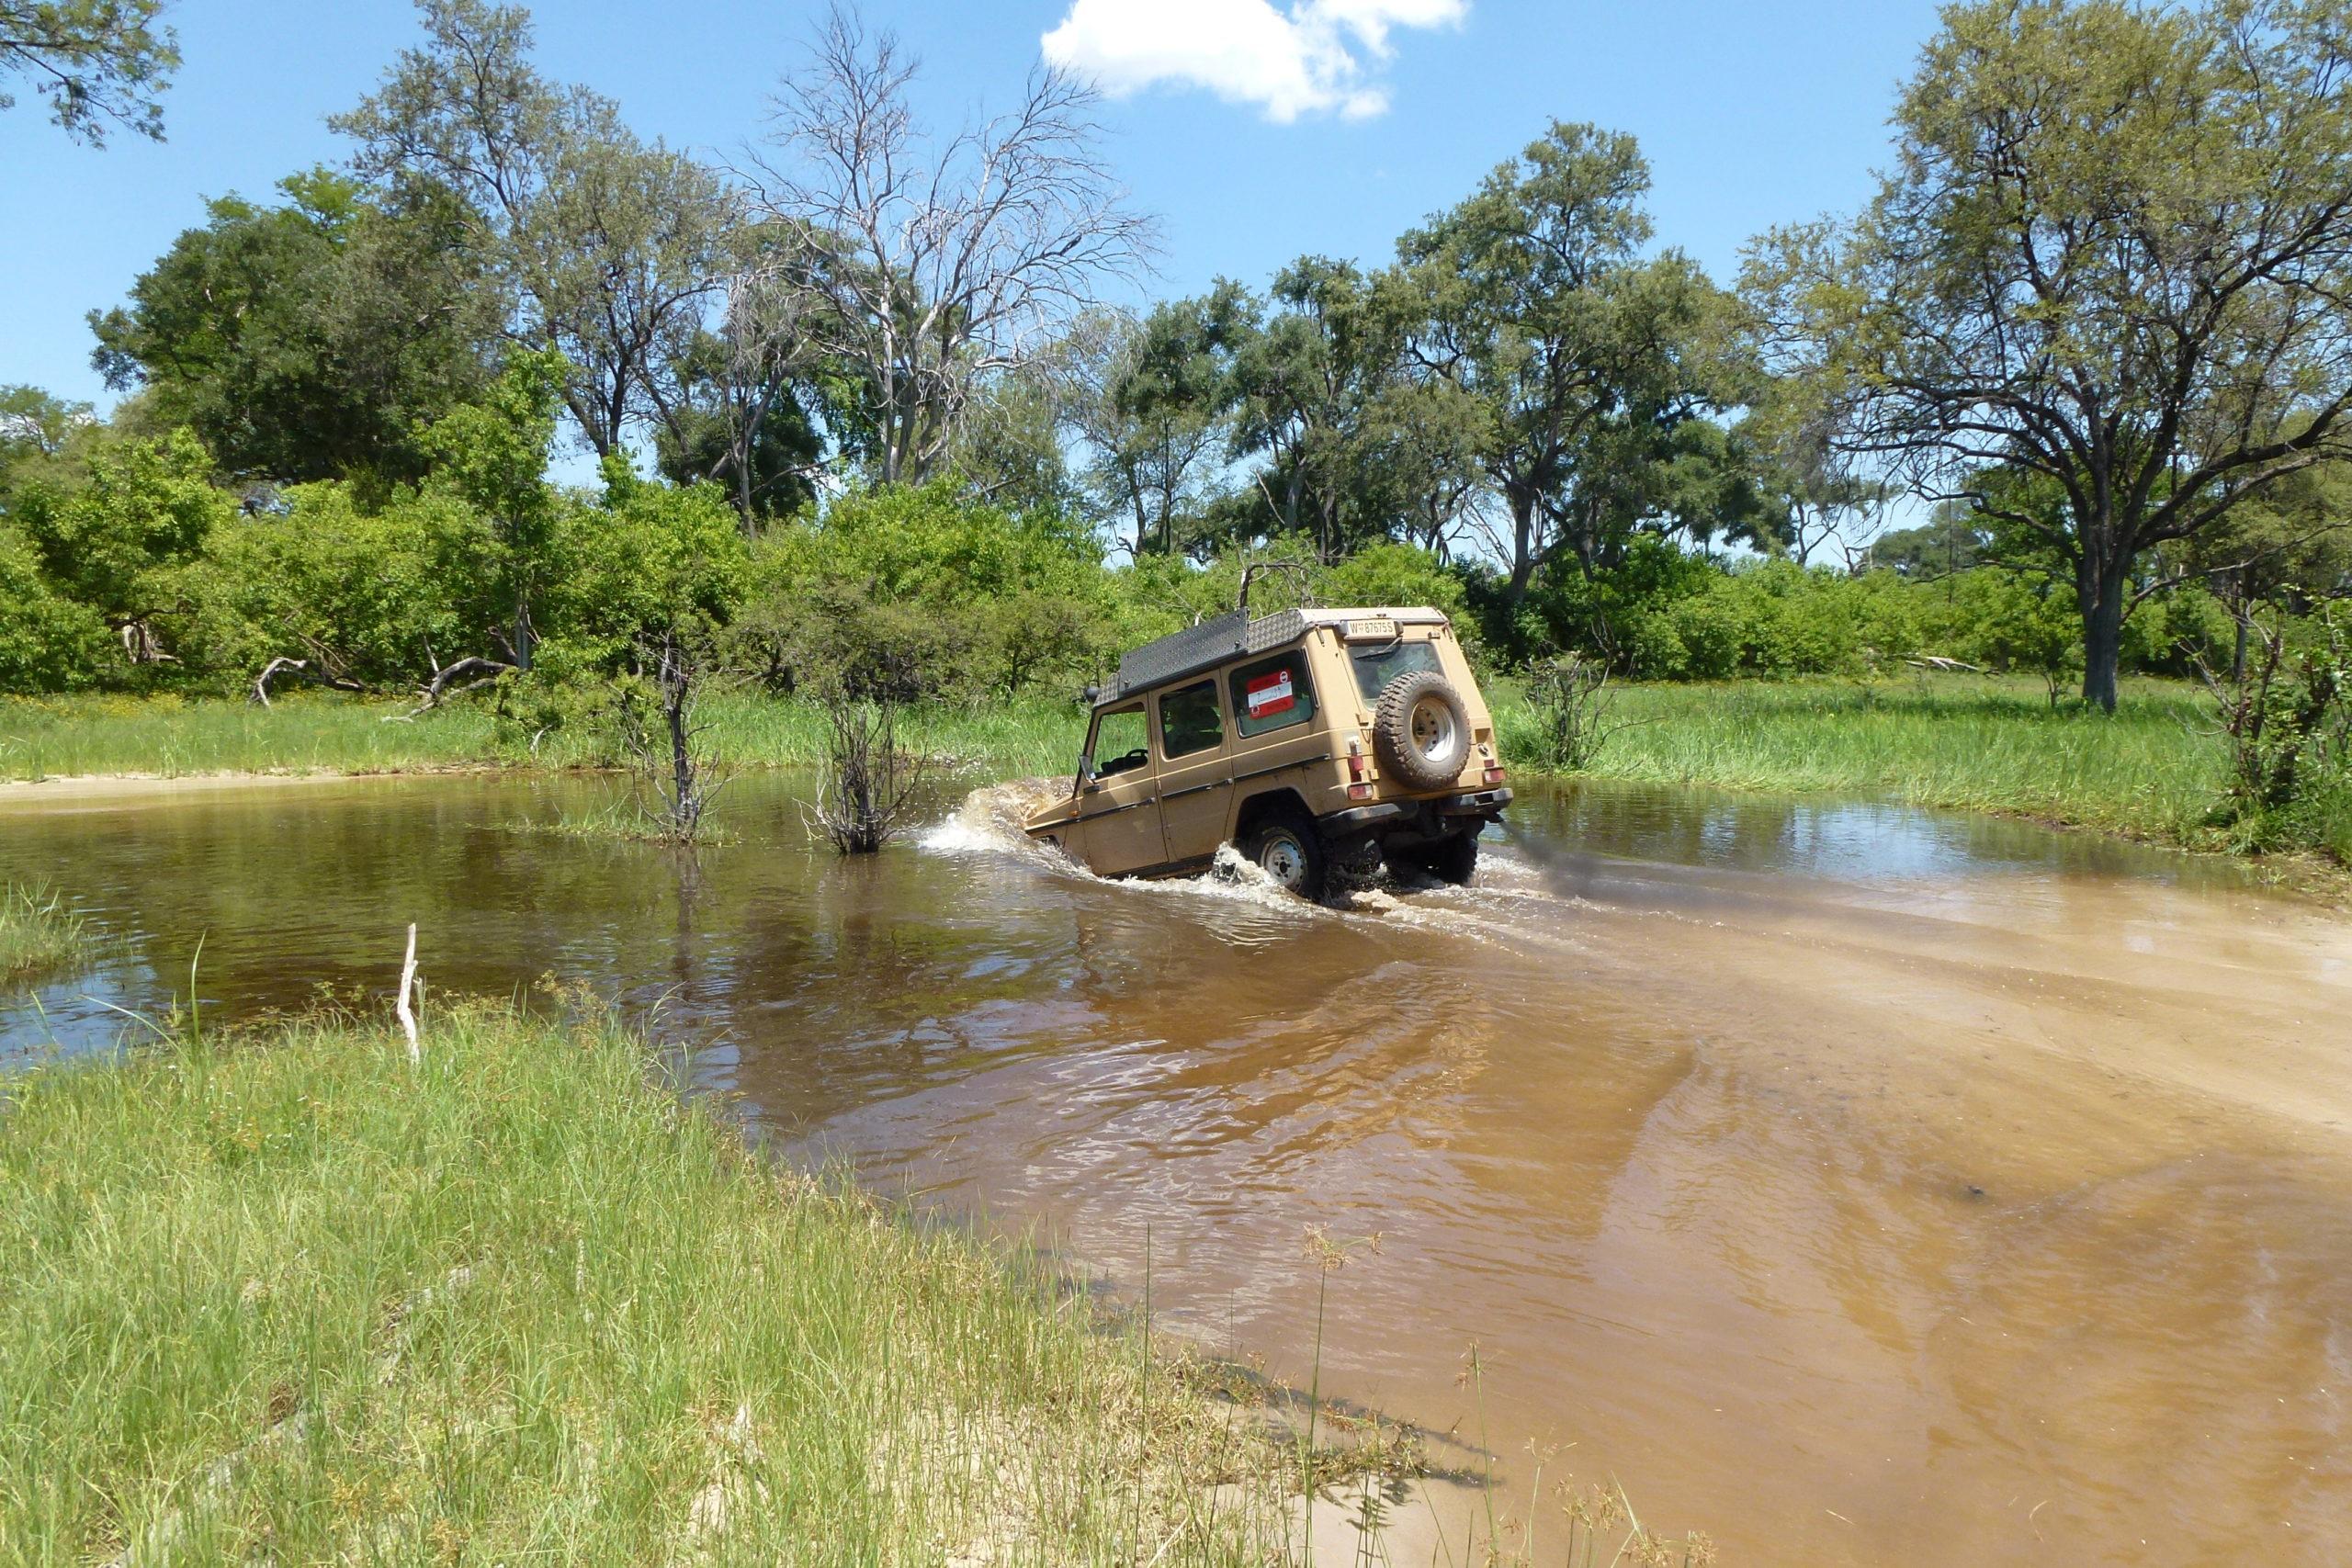 4x4 Abenteuerreise: Baden in Afrika 1